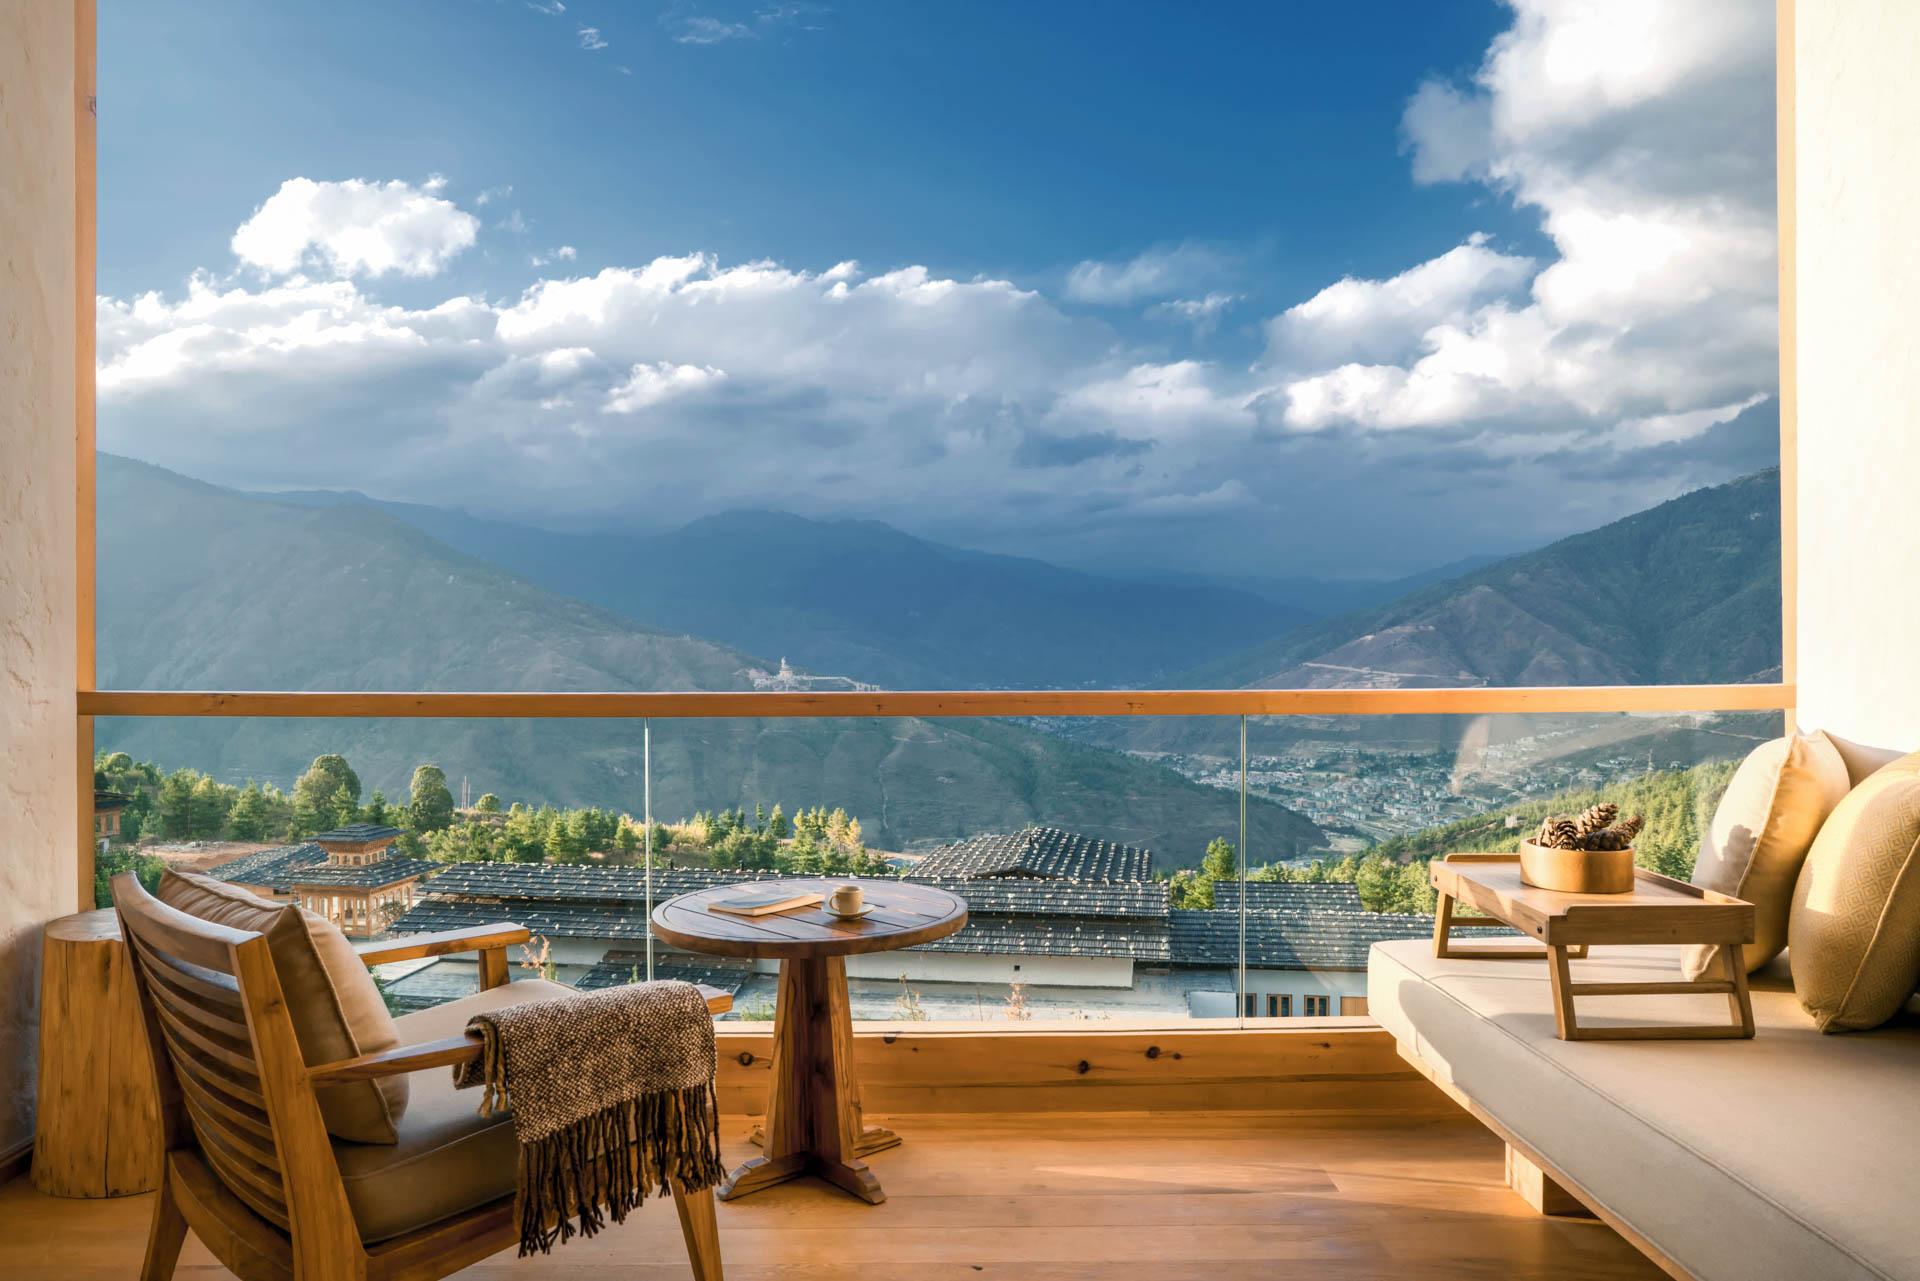 bhutan-lodge-suite-balcony-at-thimphu